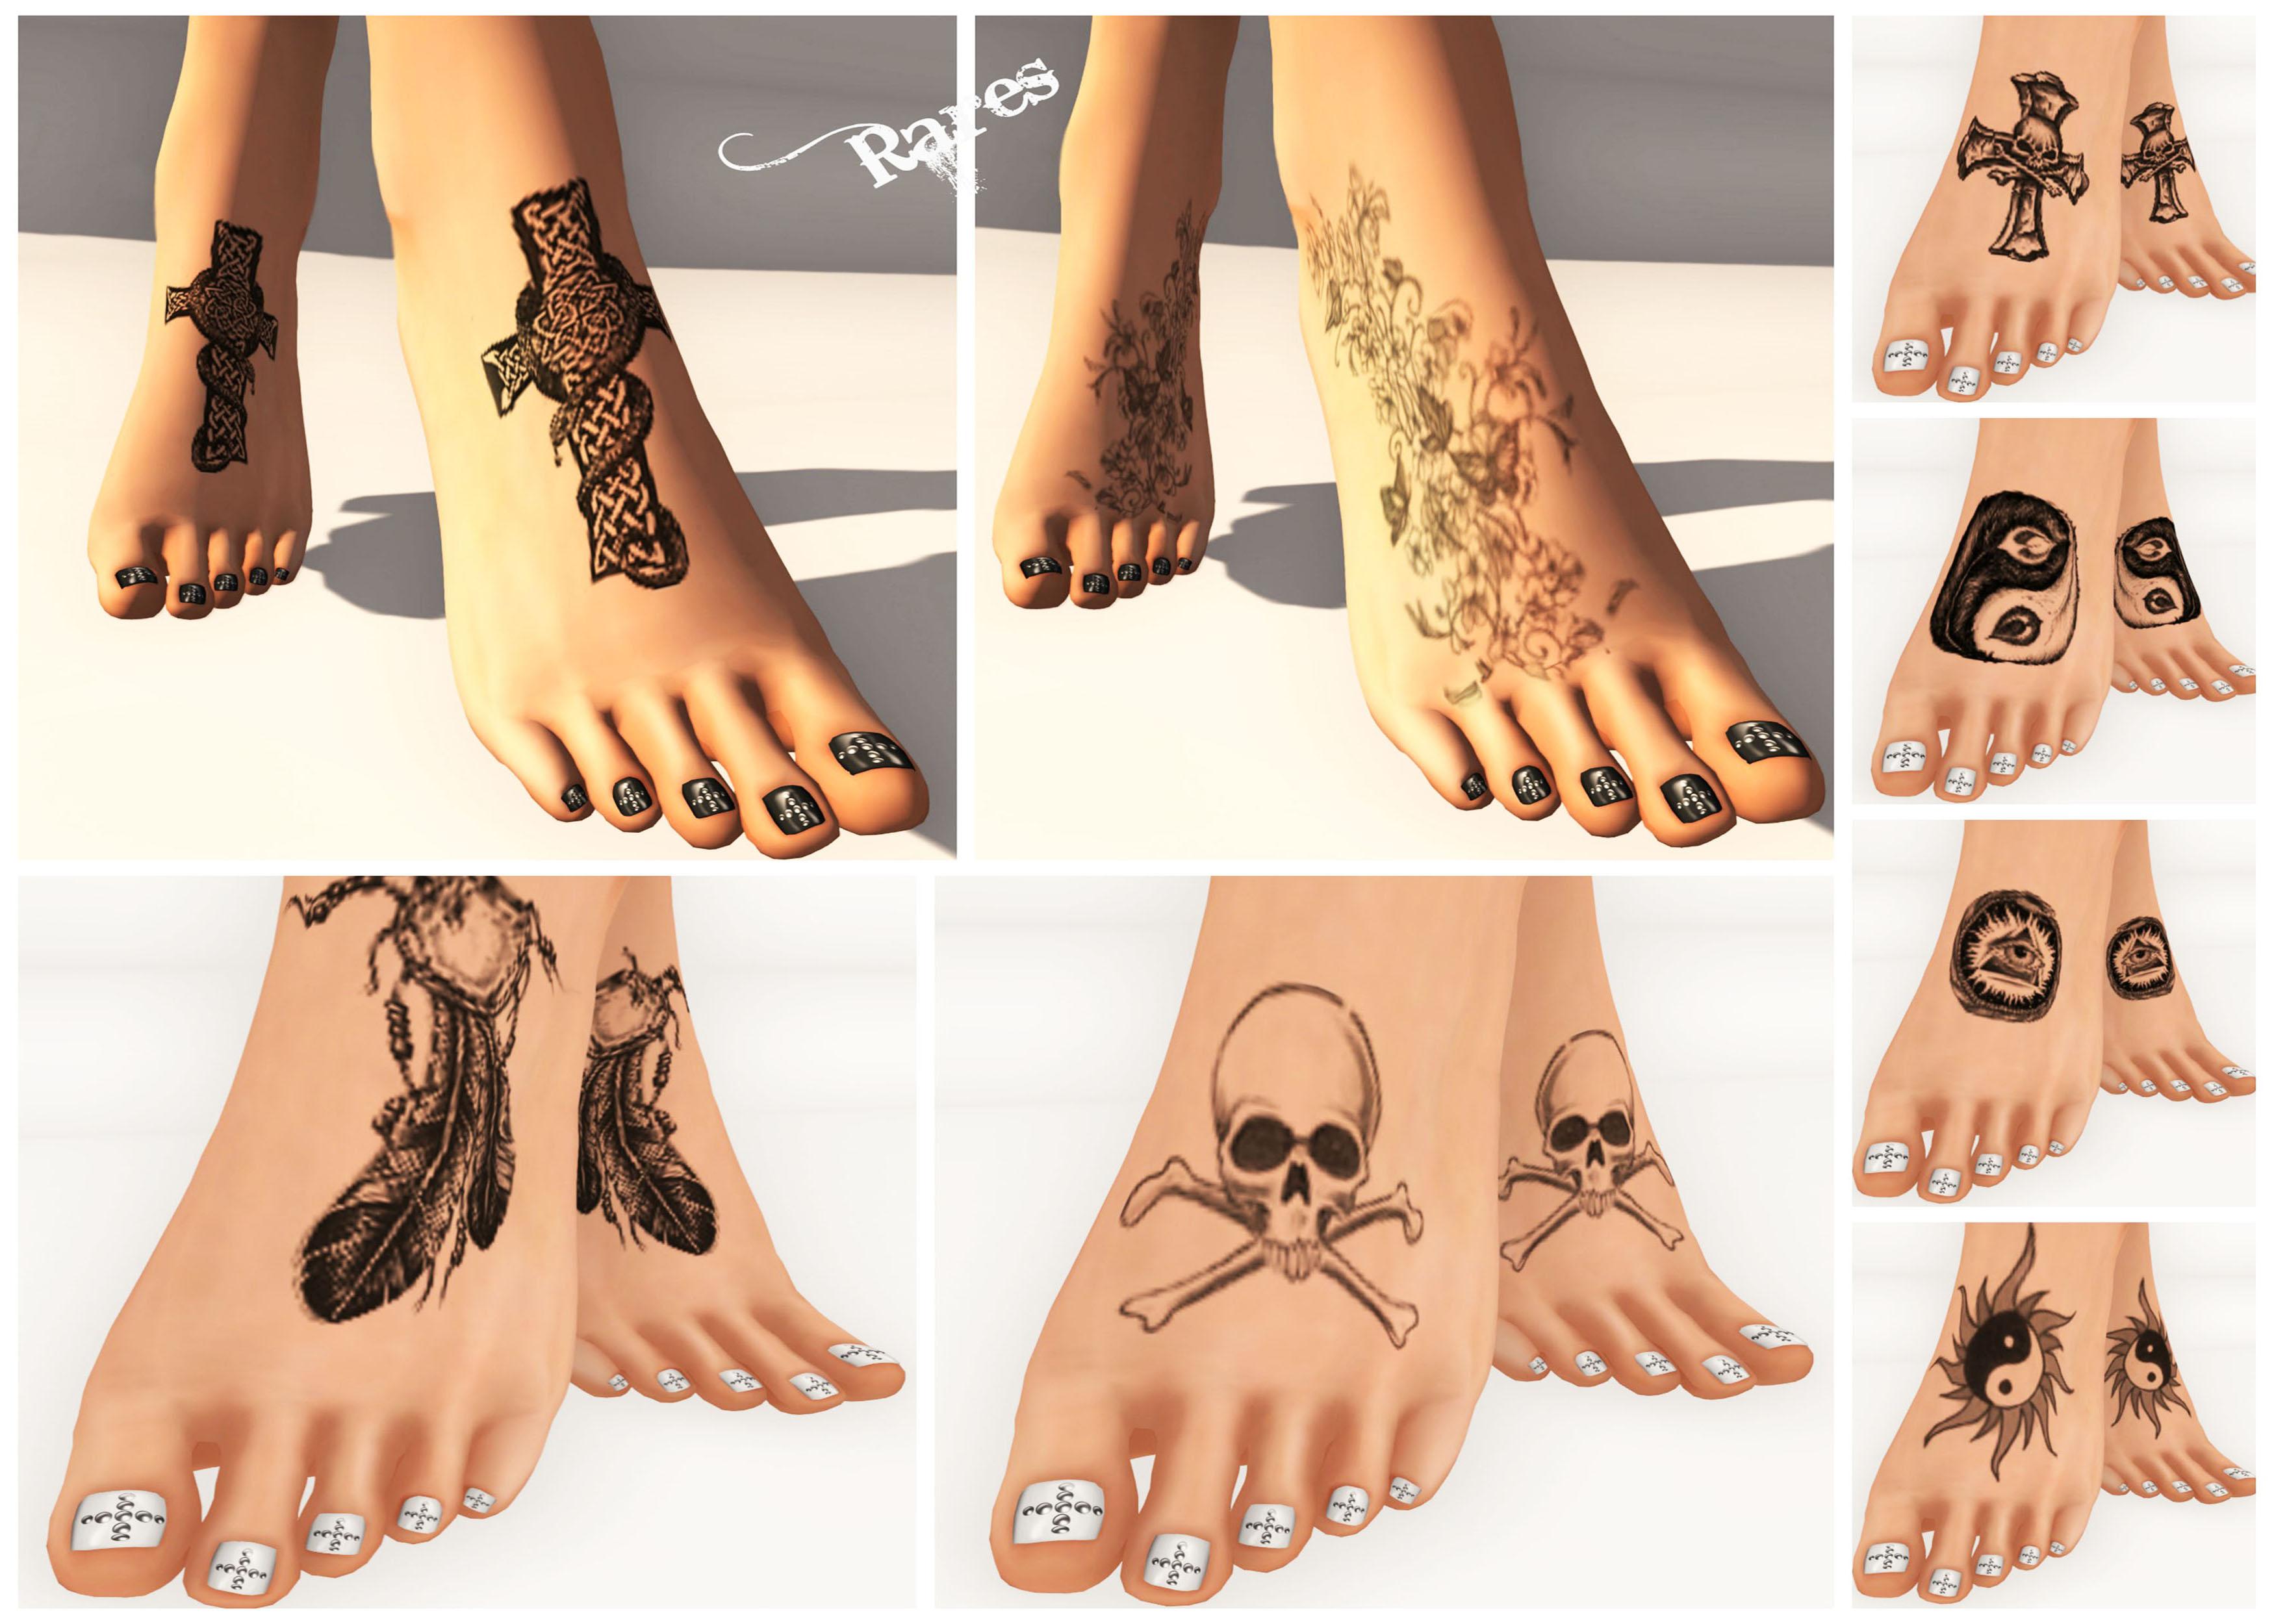 Grunge Feet Tattoos Collage